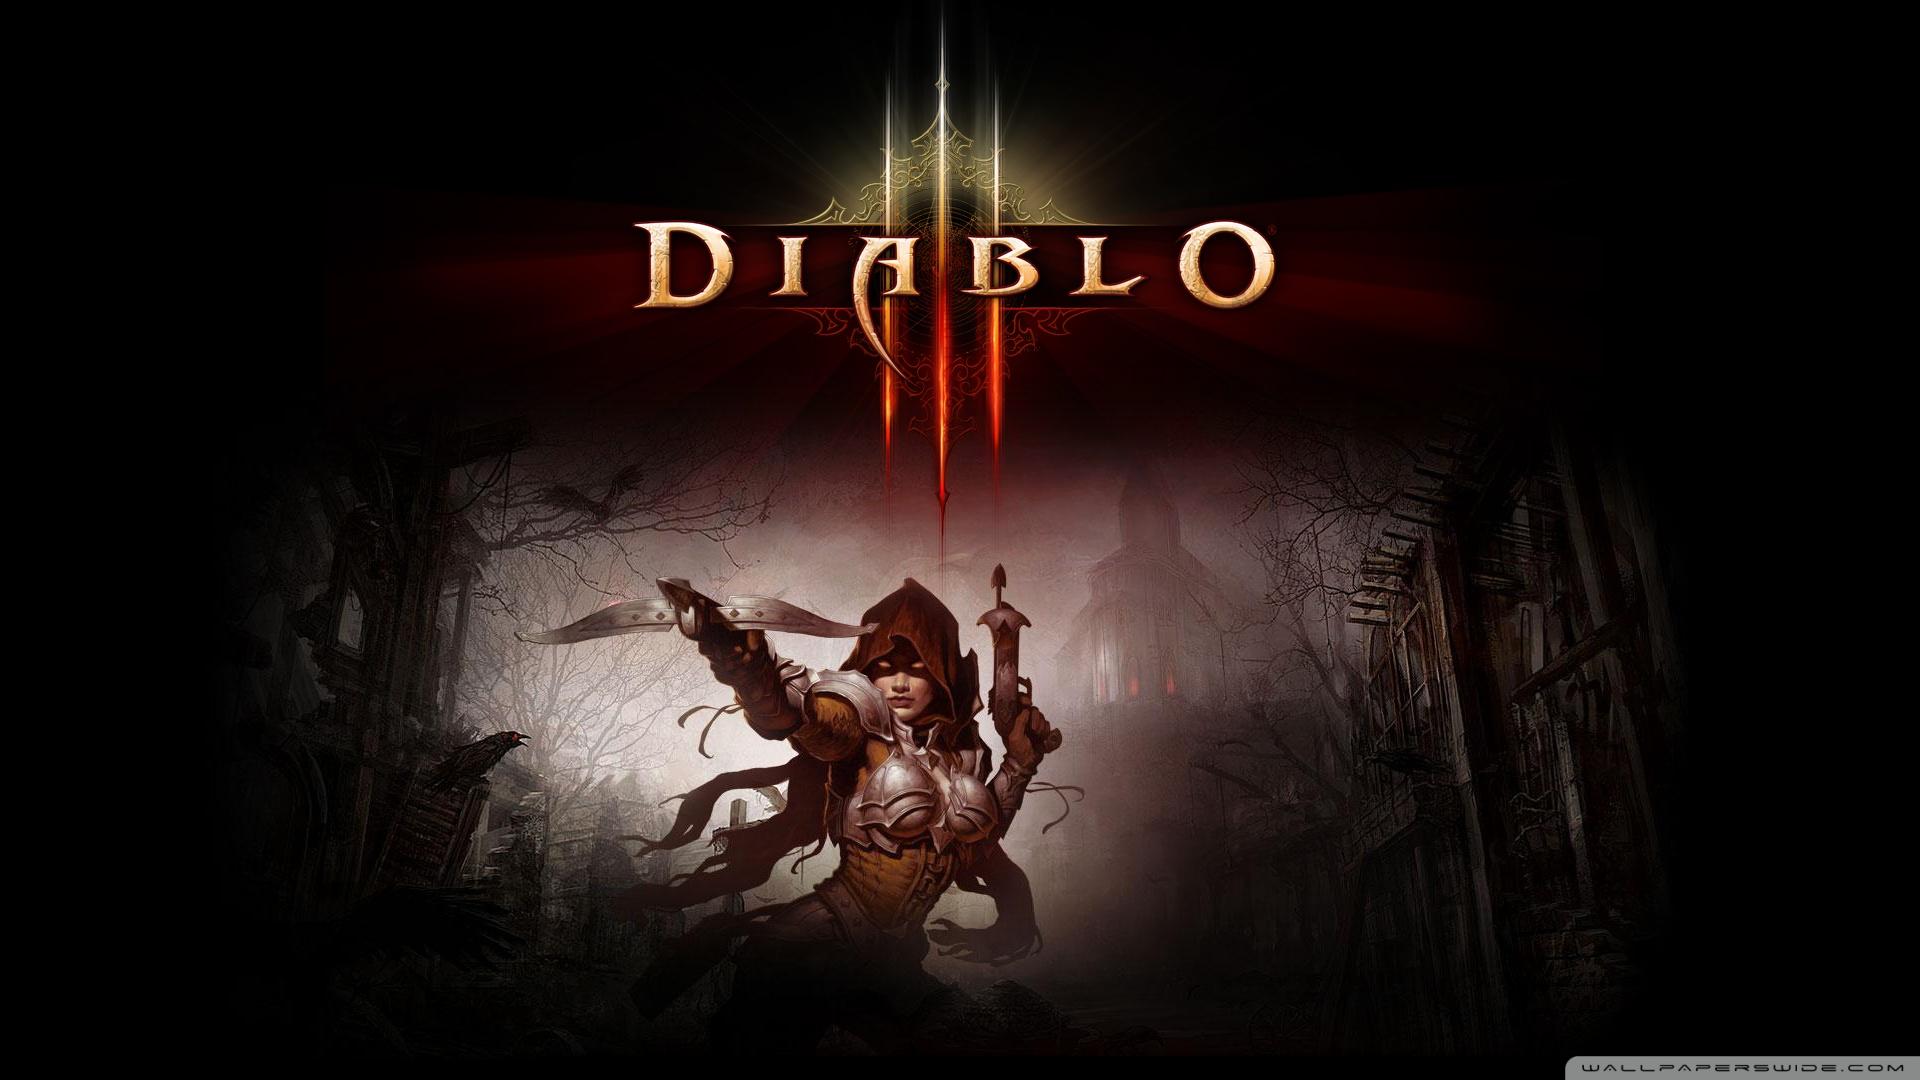 Wallpaper Diablo 3 Hd Posted By John Cunningham